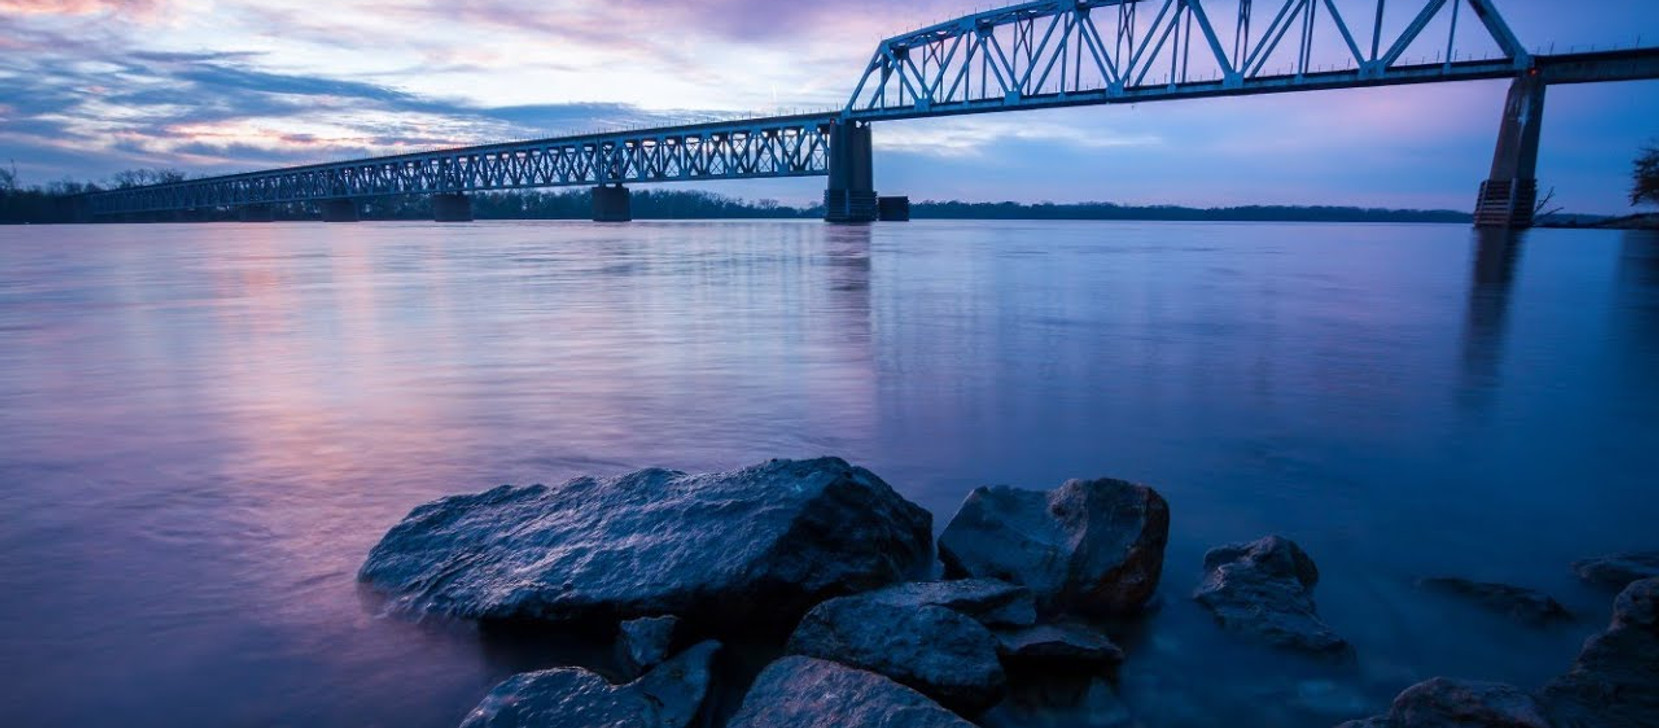 1-2-18 Quinsippi Island Train Bridge Photo Matting